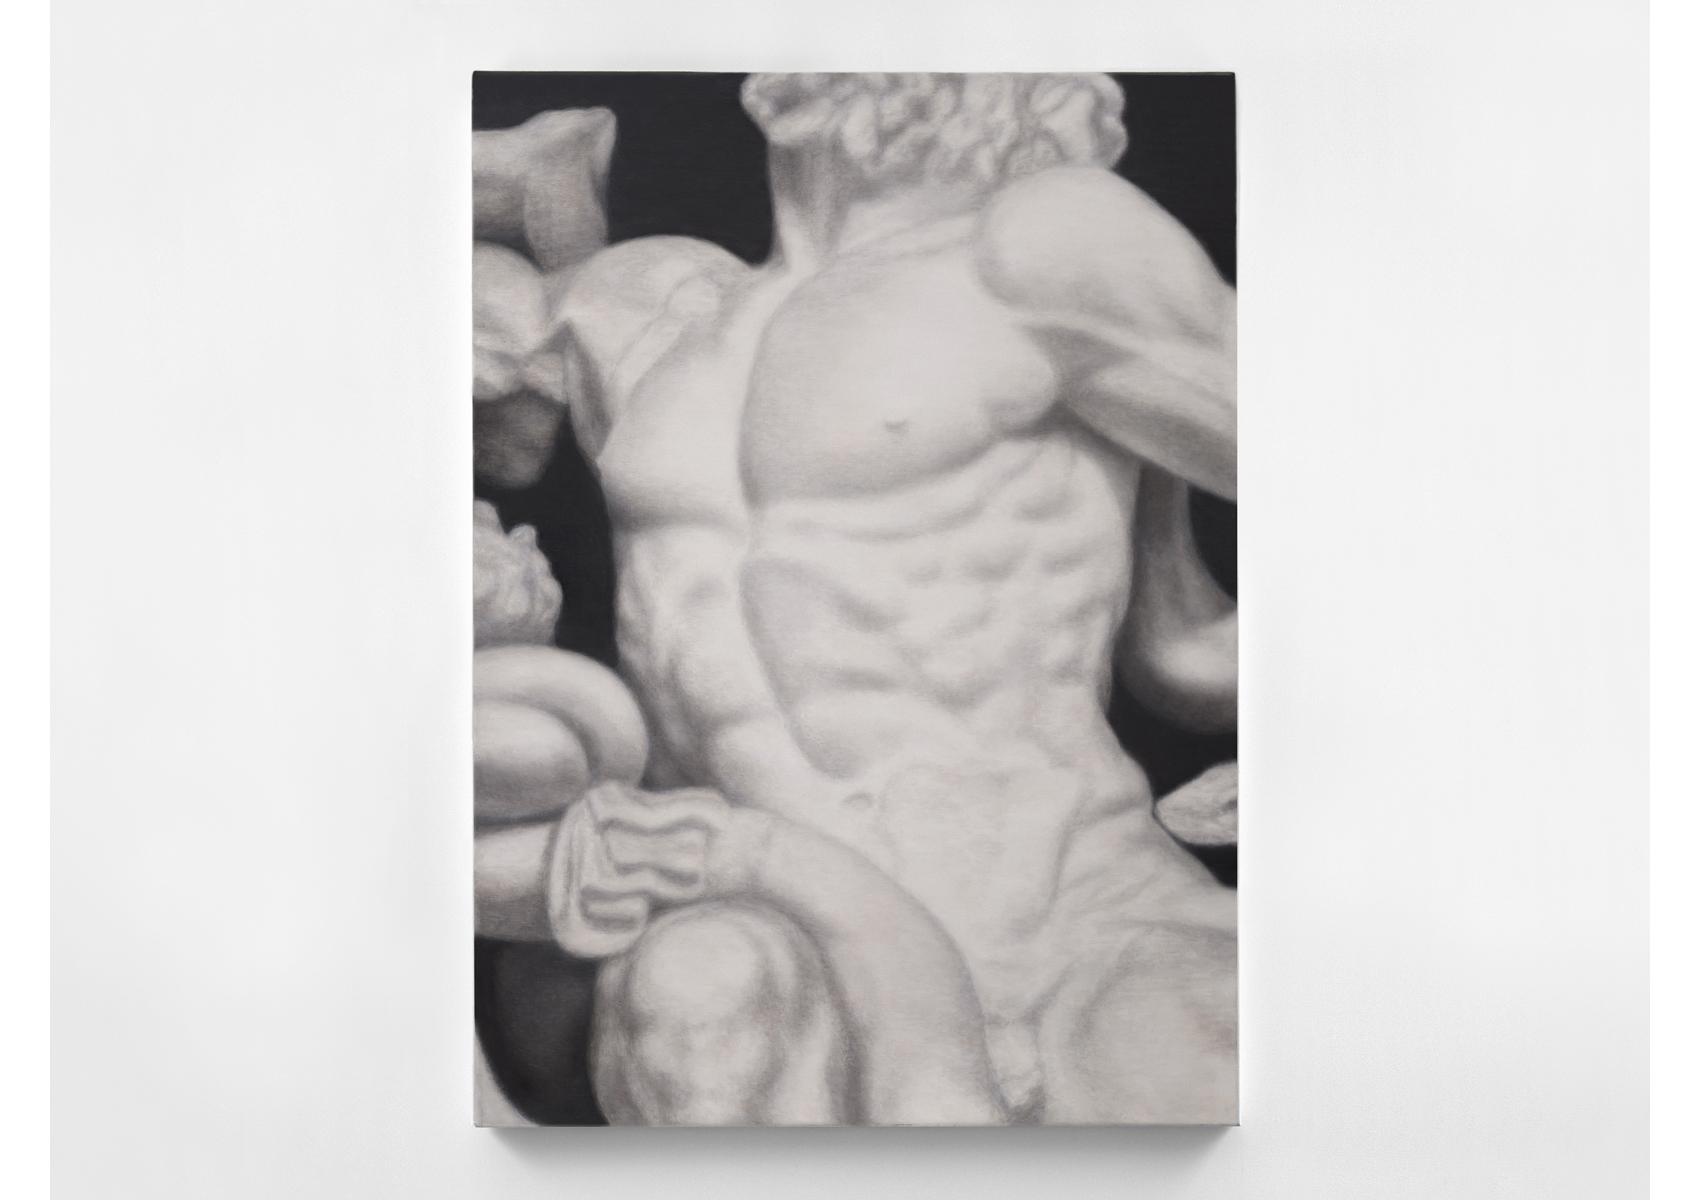 MONUMENT / Marble / 2014 / 12O x 168 x 4 cm / oil on canvas